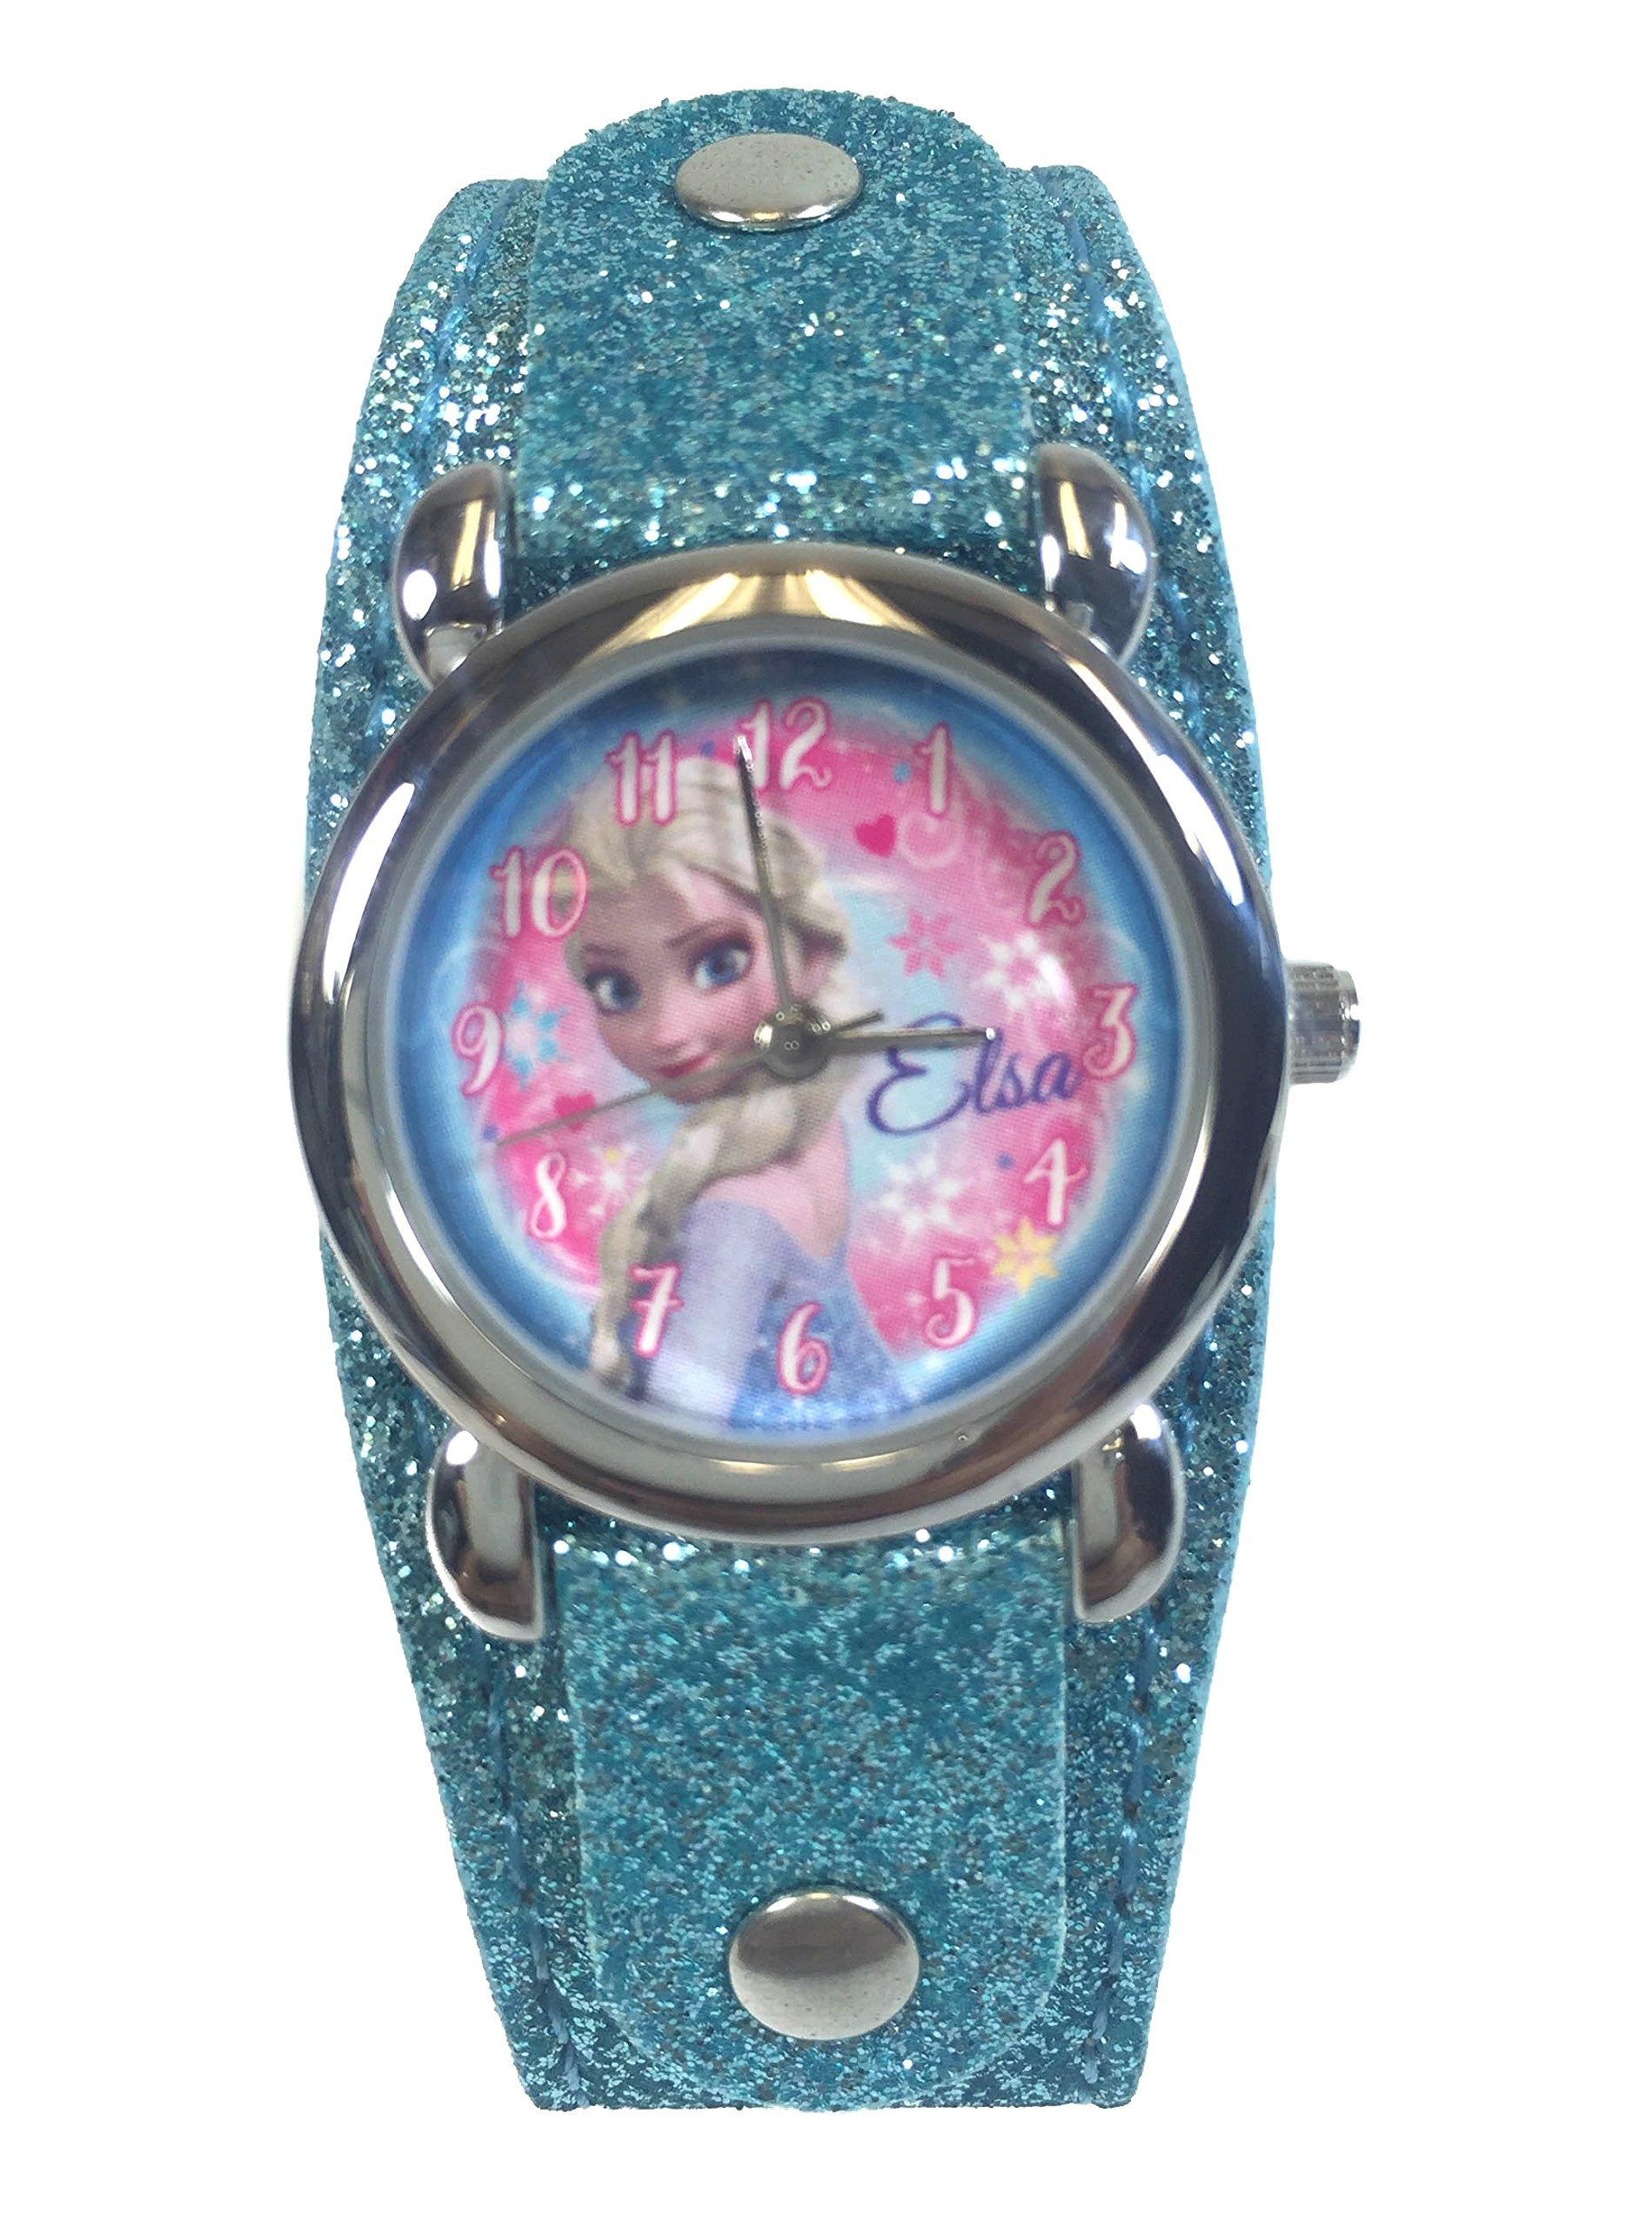 Disney Frozen Watch with Metal Face & Glitter - Baby Blue